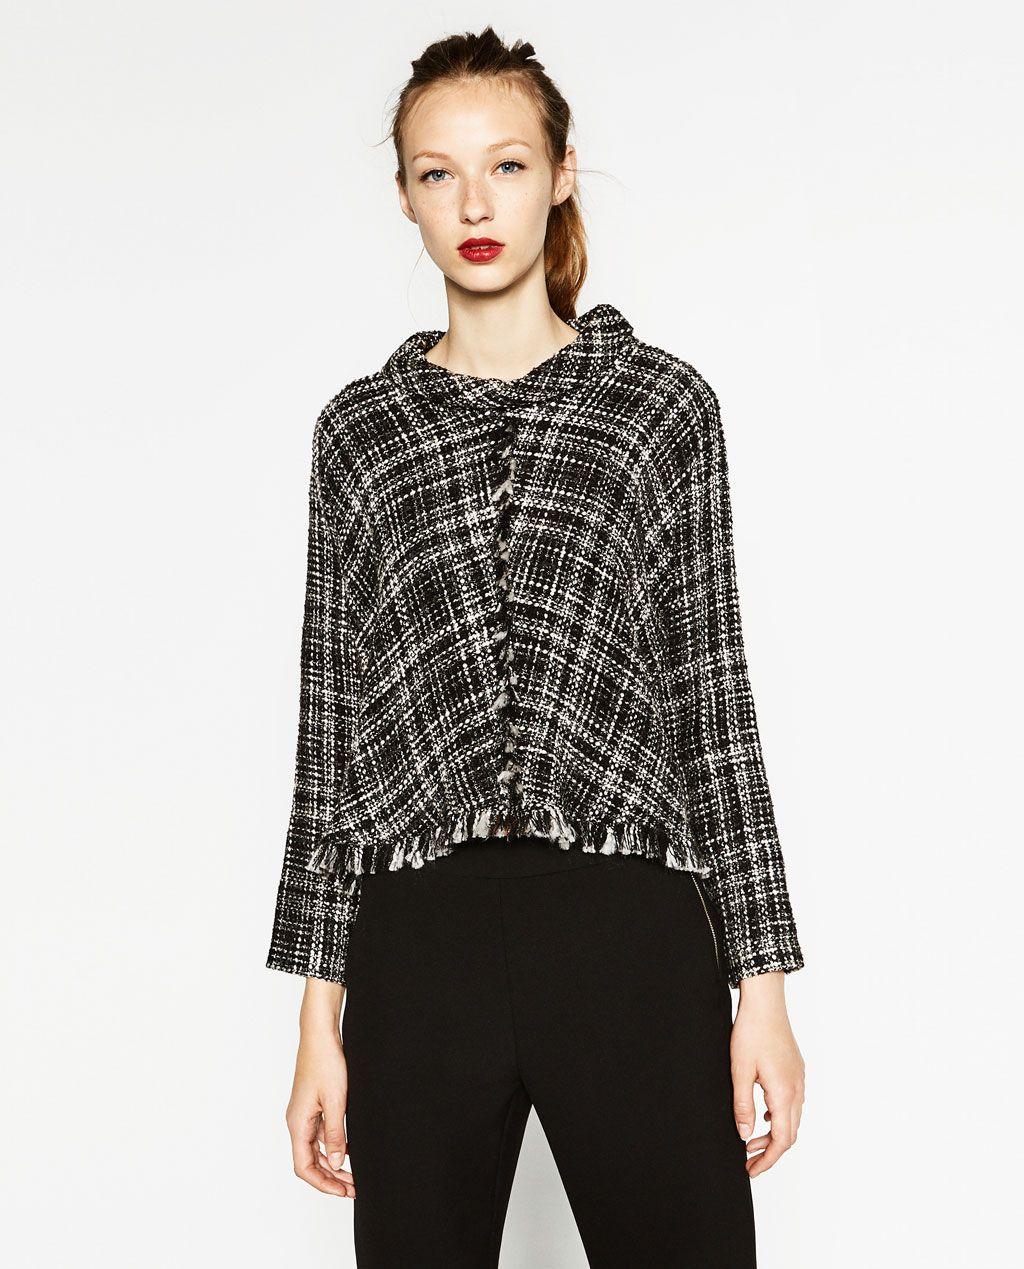 70c47a6b1682a7 FRAYED TWEED TOP from Zara Zara Women, Tween, Fall 2016, Blouses, Style